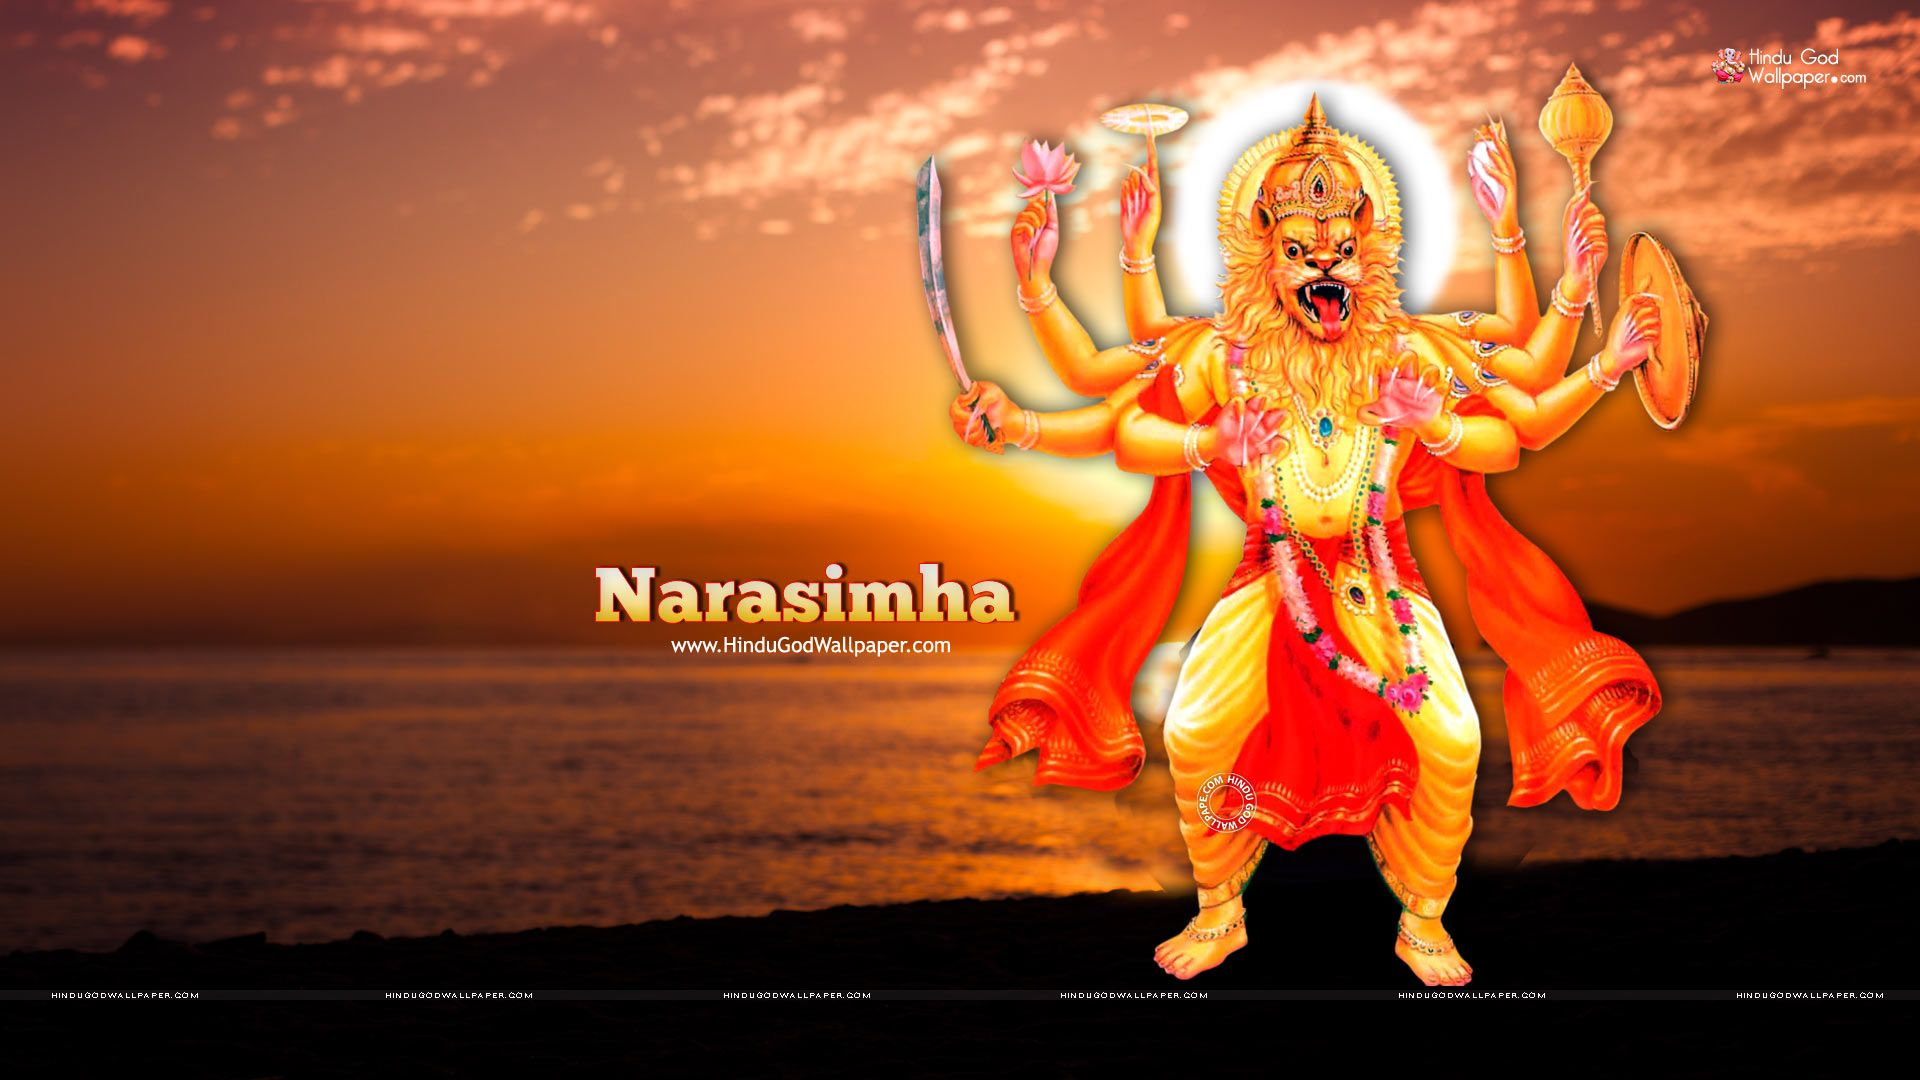 1080p Lord Narasimha Hd Wallpapers Hd Wallpaper Wallpaper Shiva Parvati Images